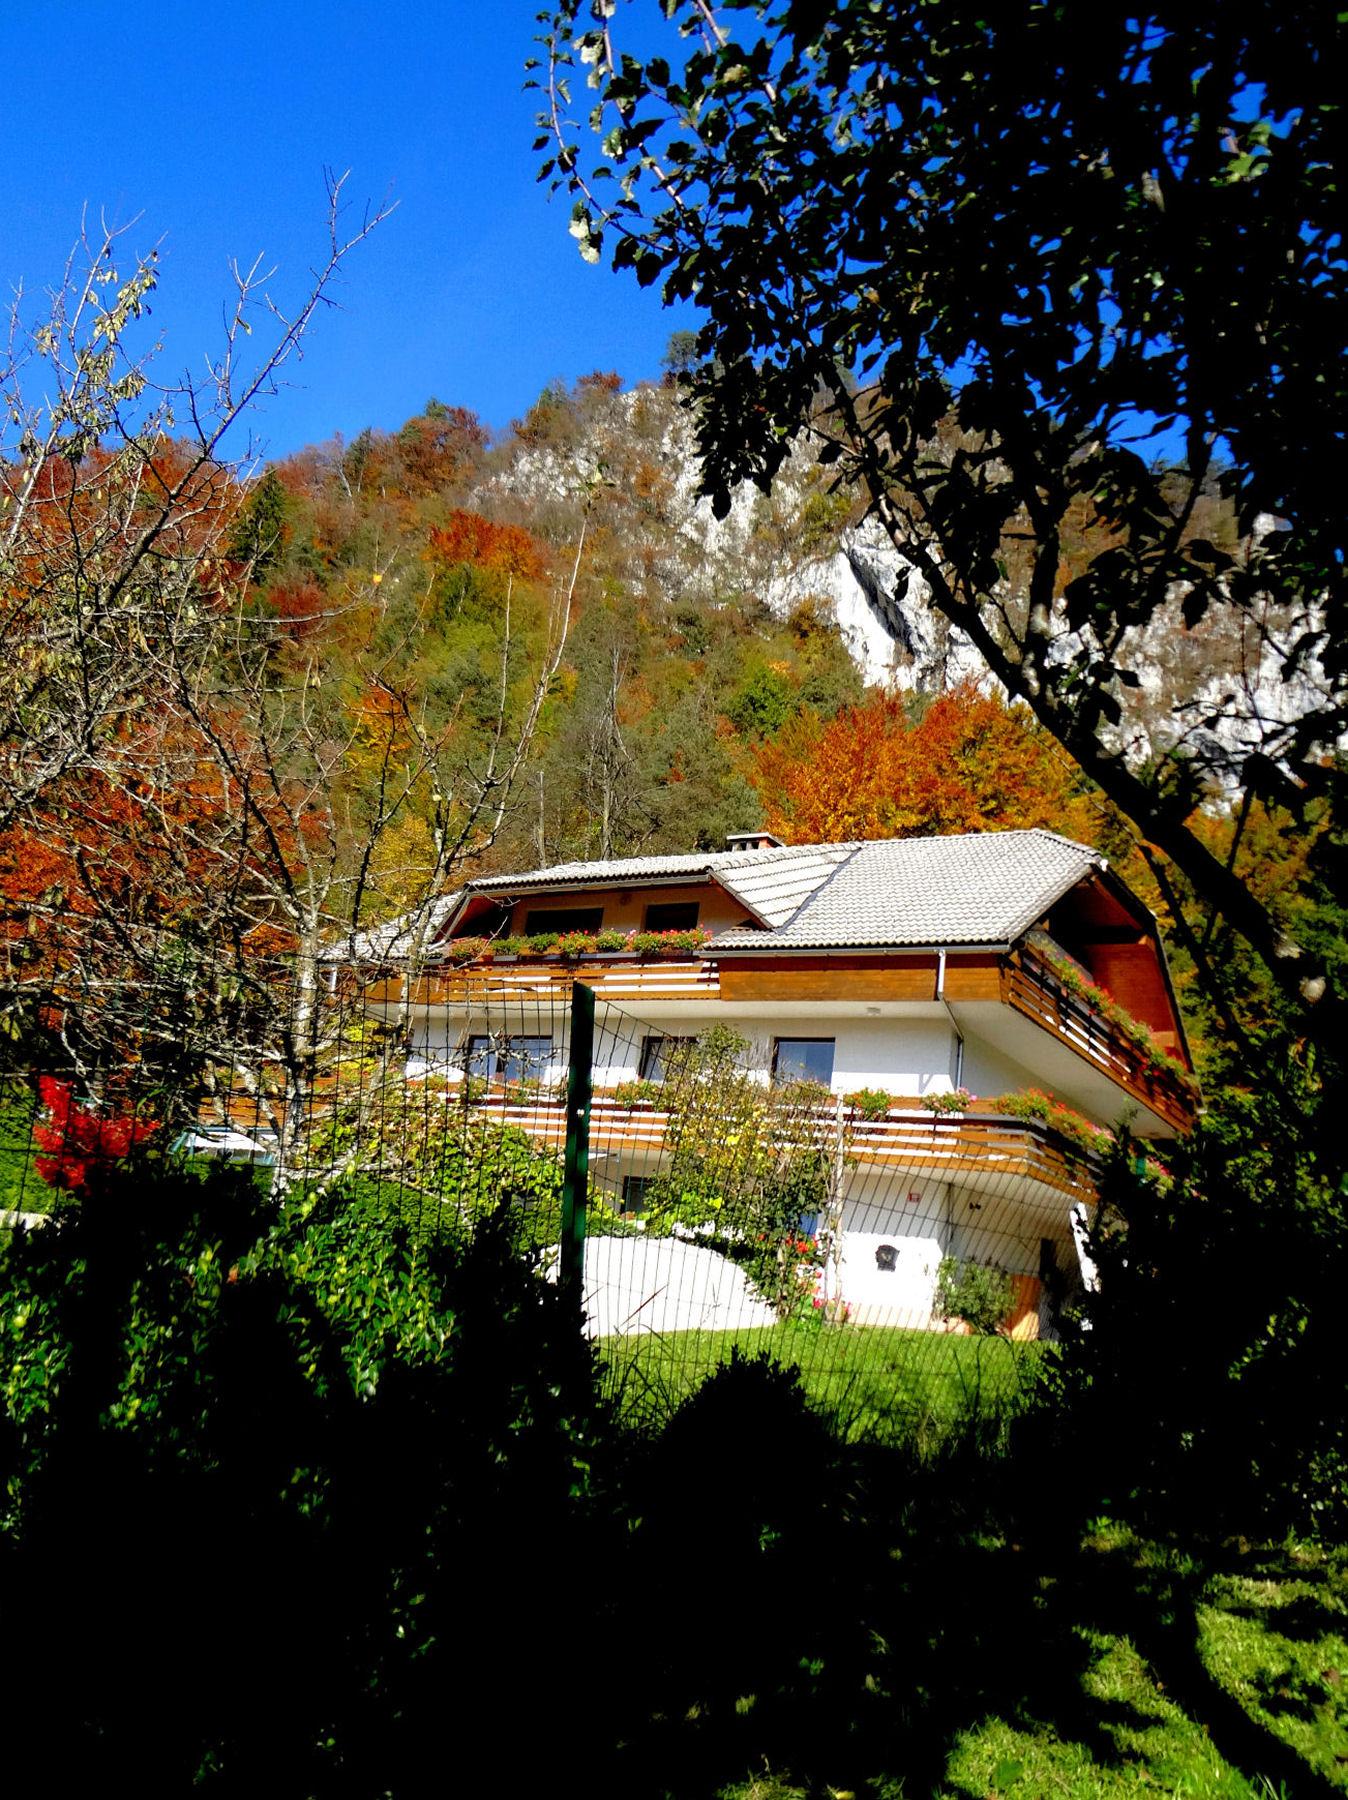 autumn-nature-slovenia-013